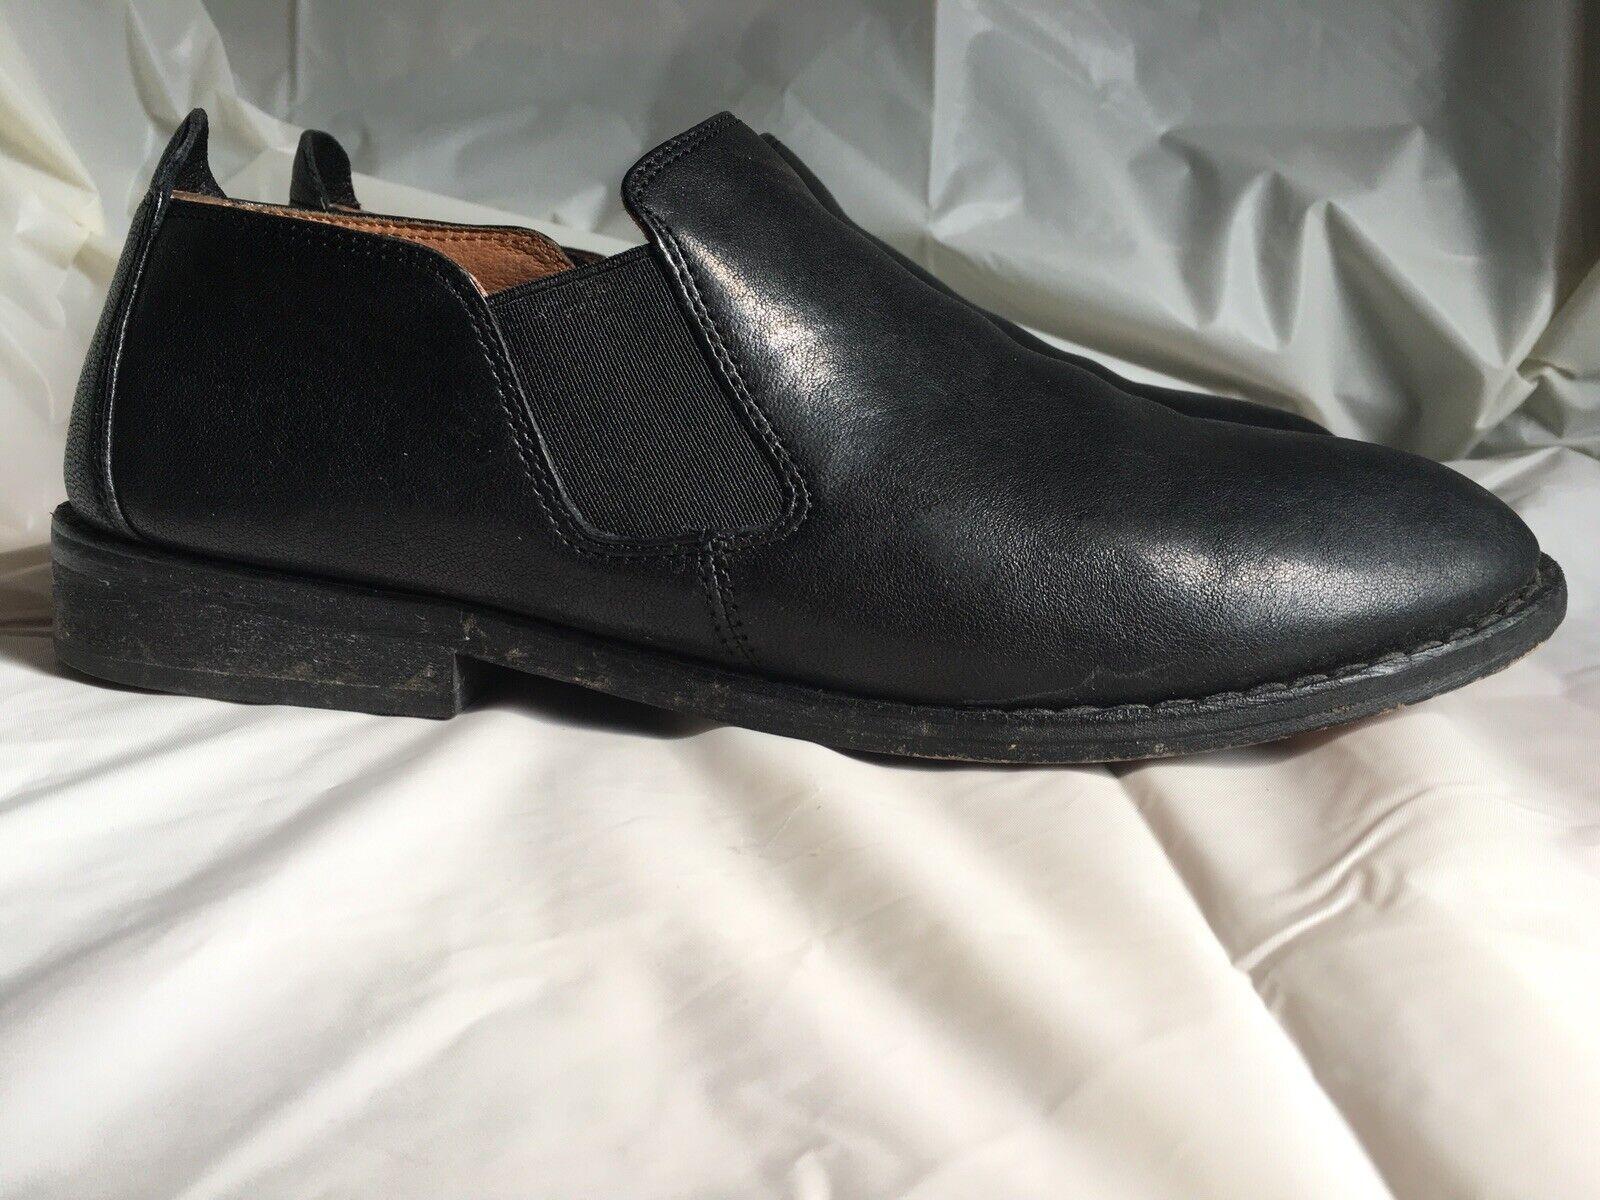 buy popular a452d f03fa Gentle Souls Essex Black Leather Ankle Ankle Ankle Boots sz 8.5 EUC aea2e0